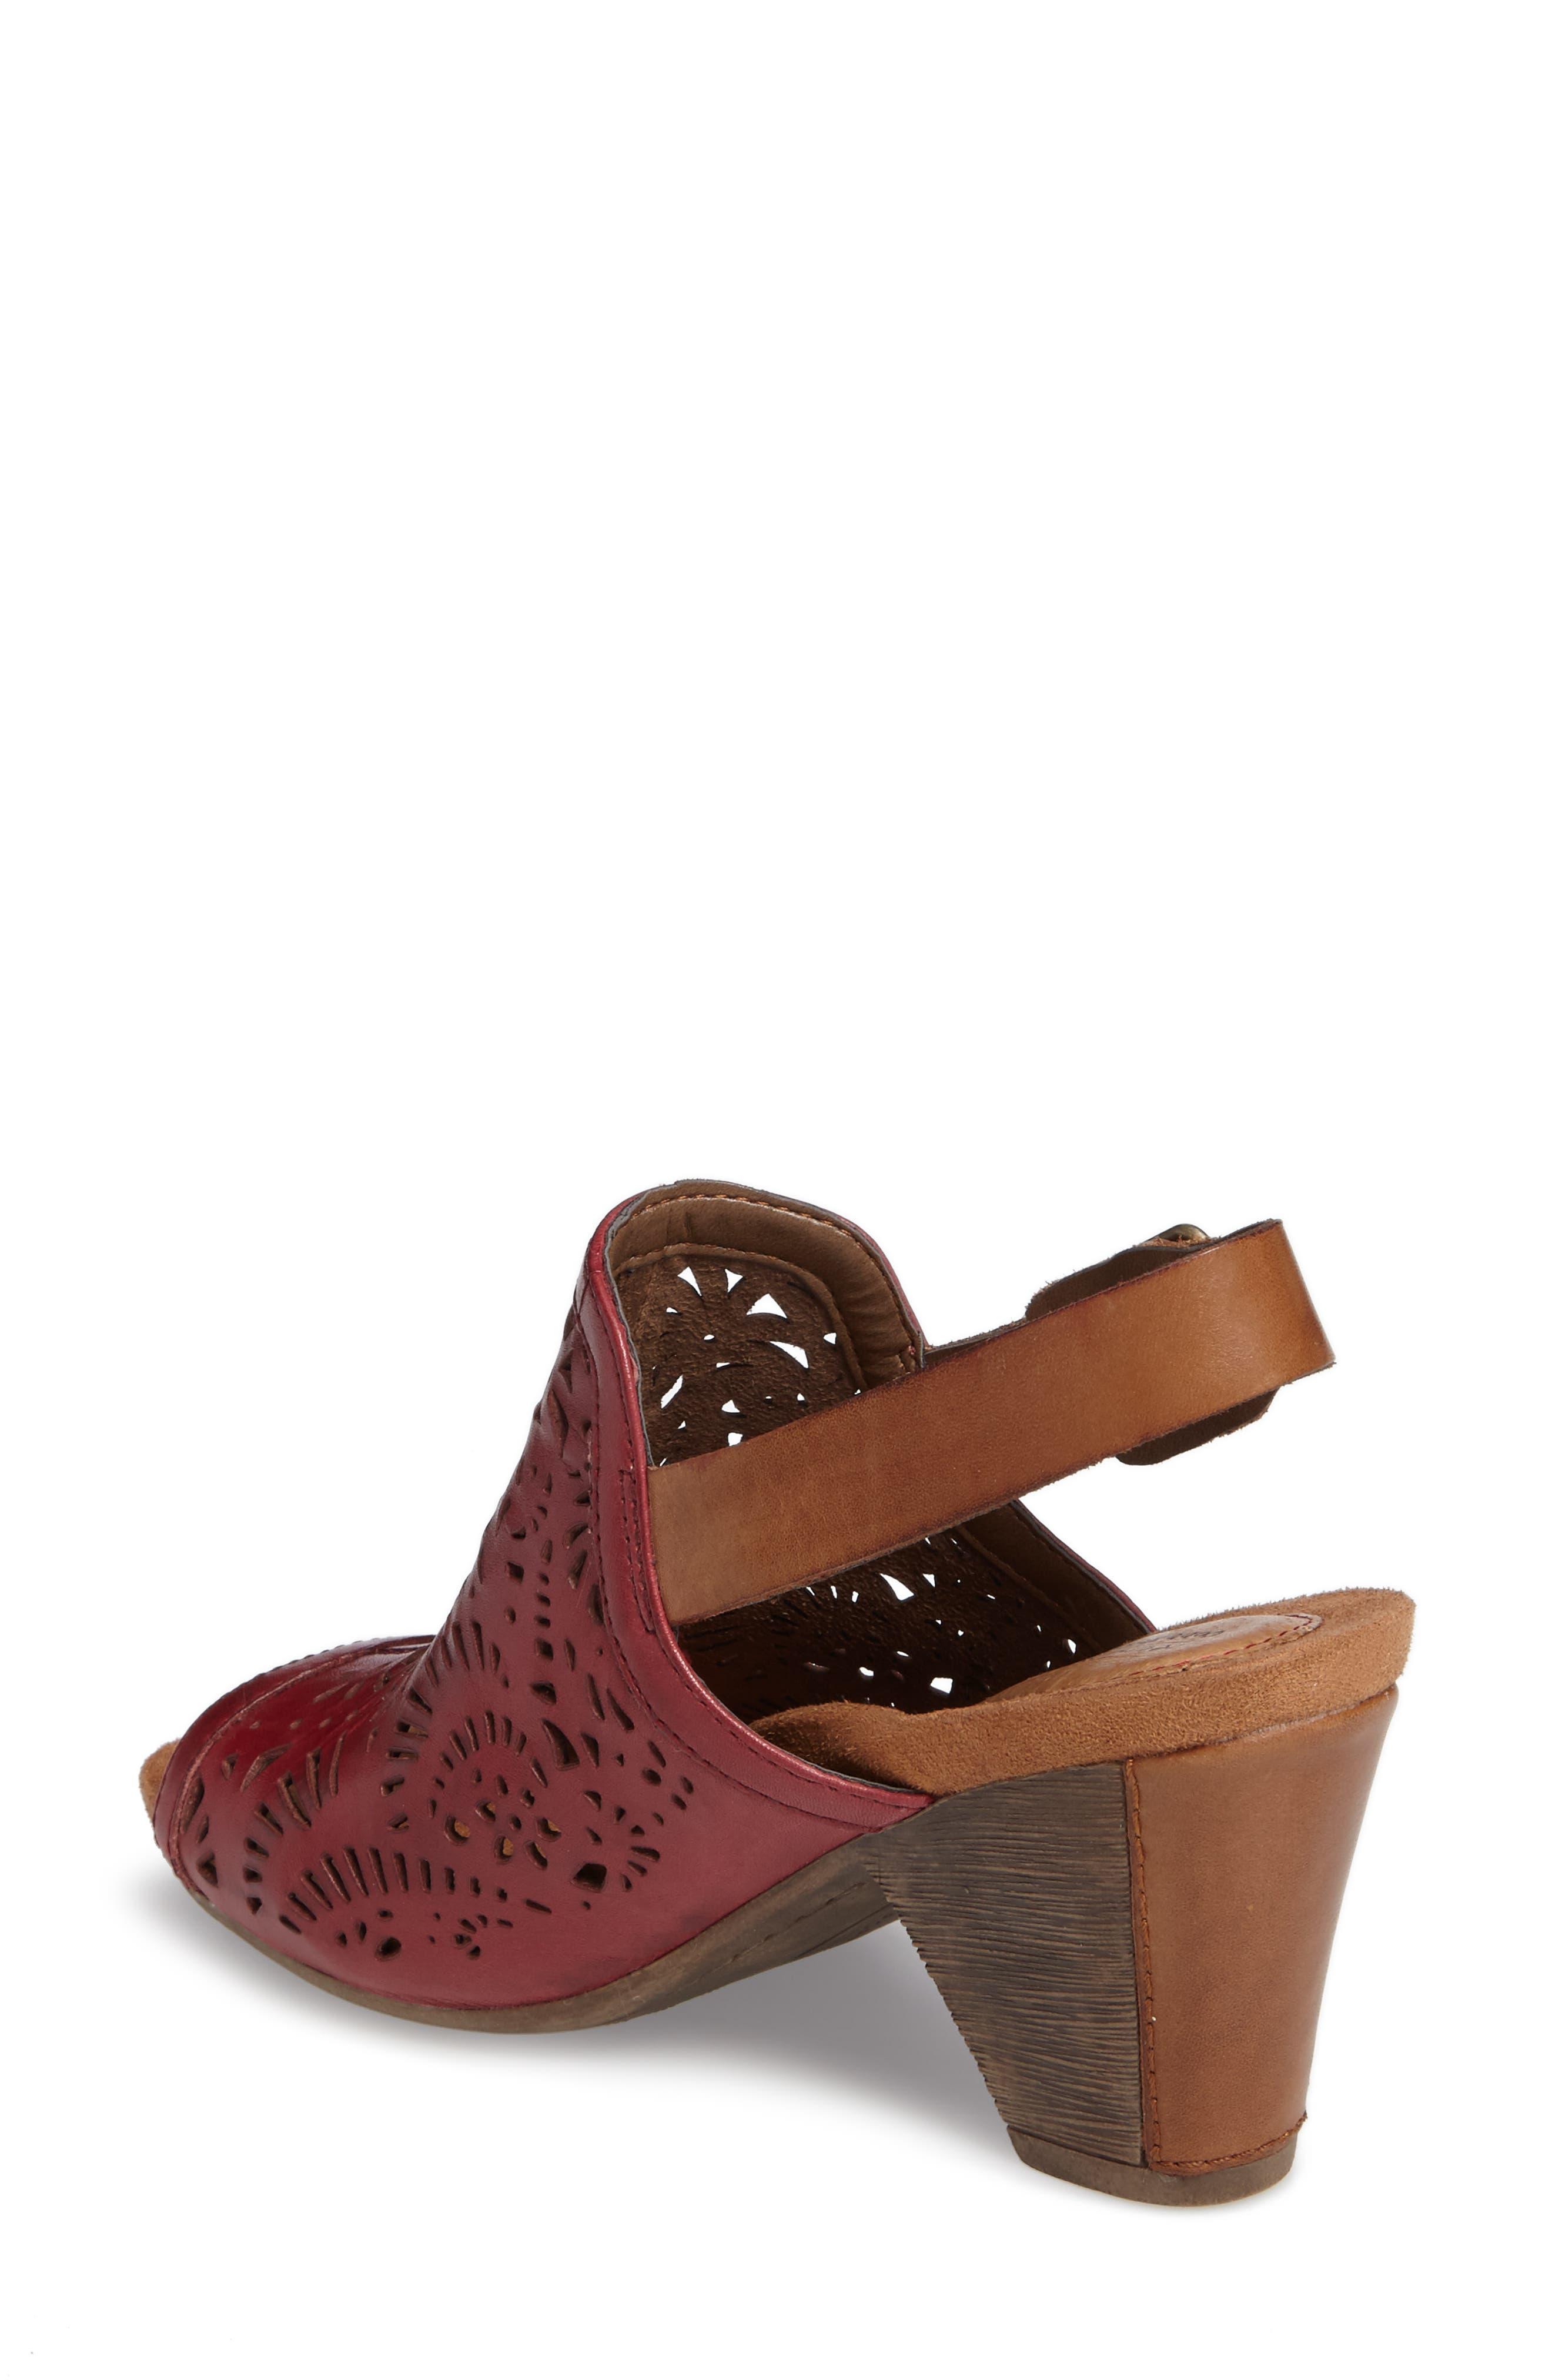 Tropez Block Heel Sandal,                             Alternate thumbnail 8, color,